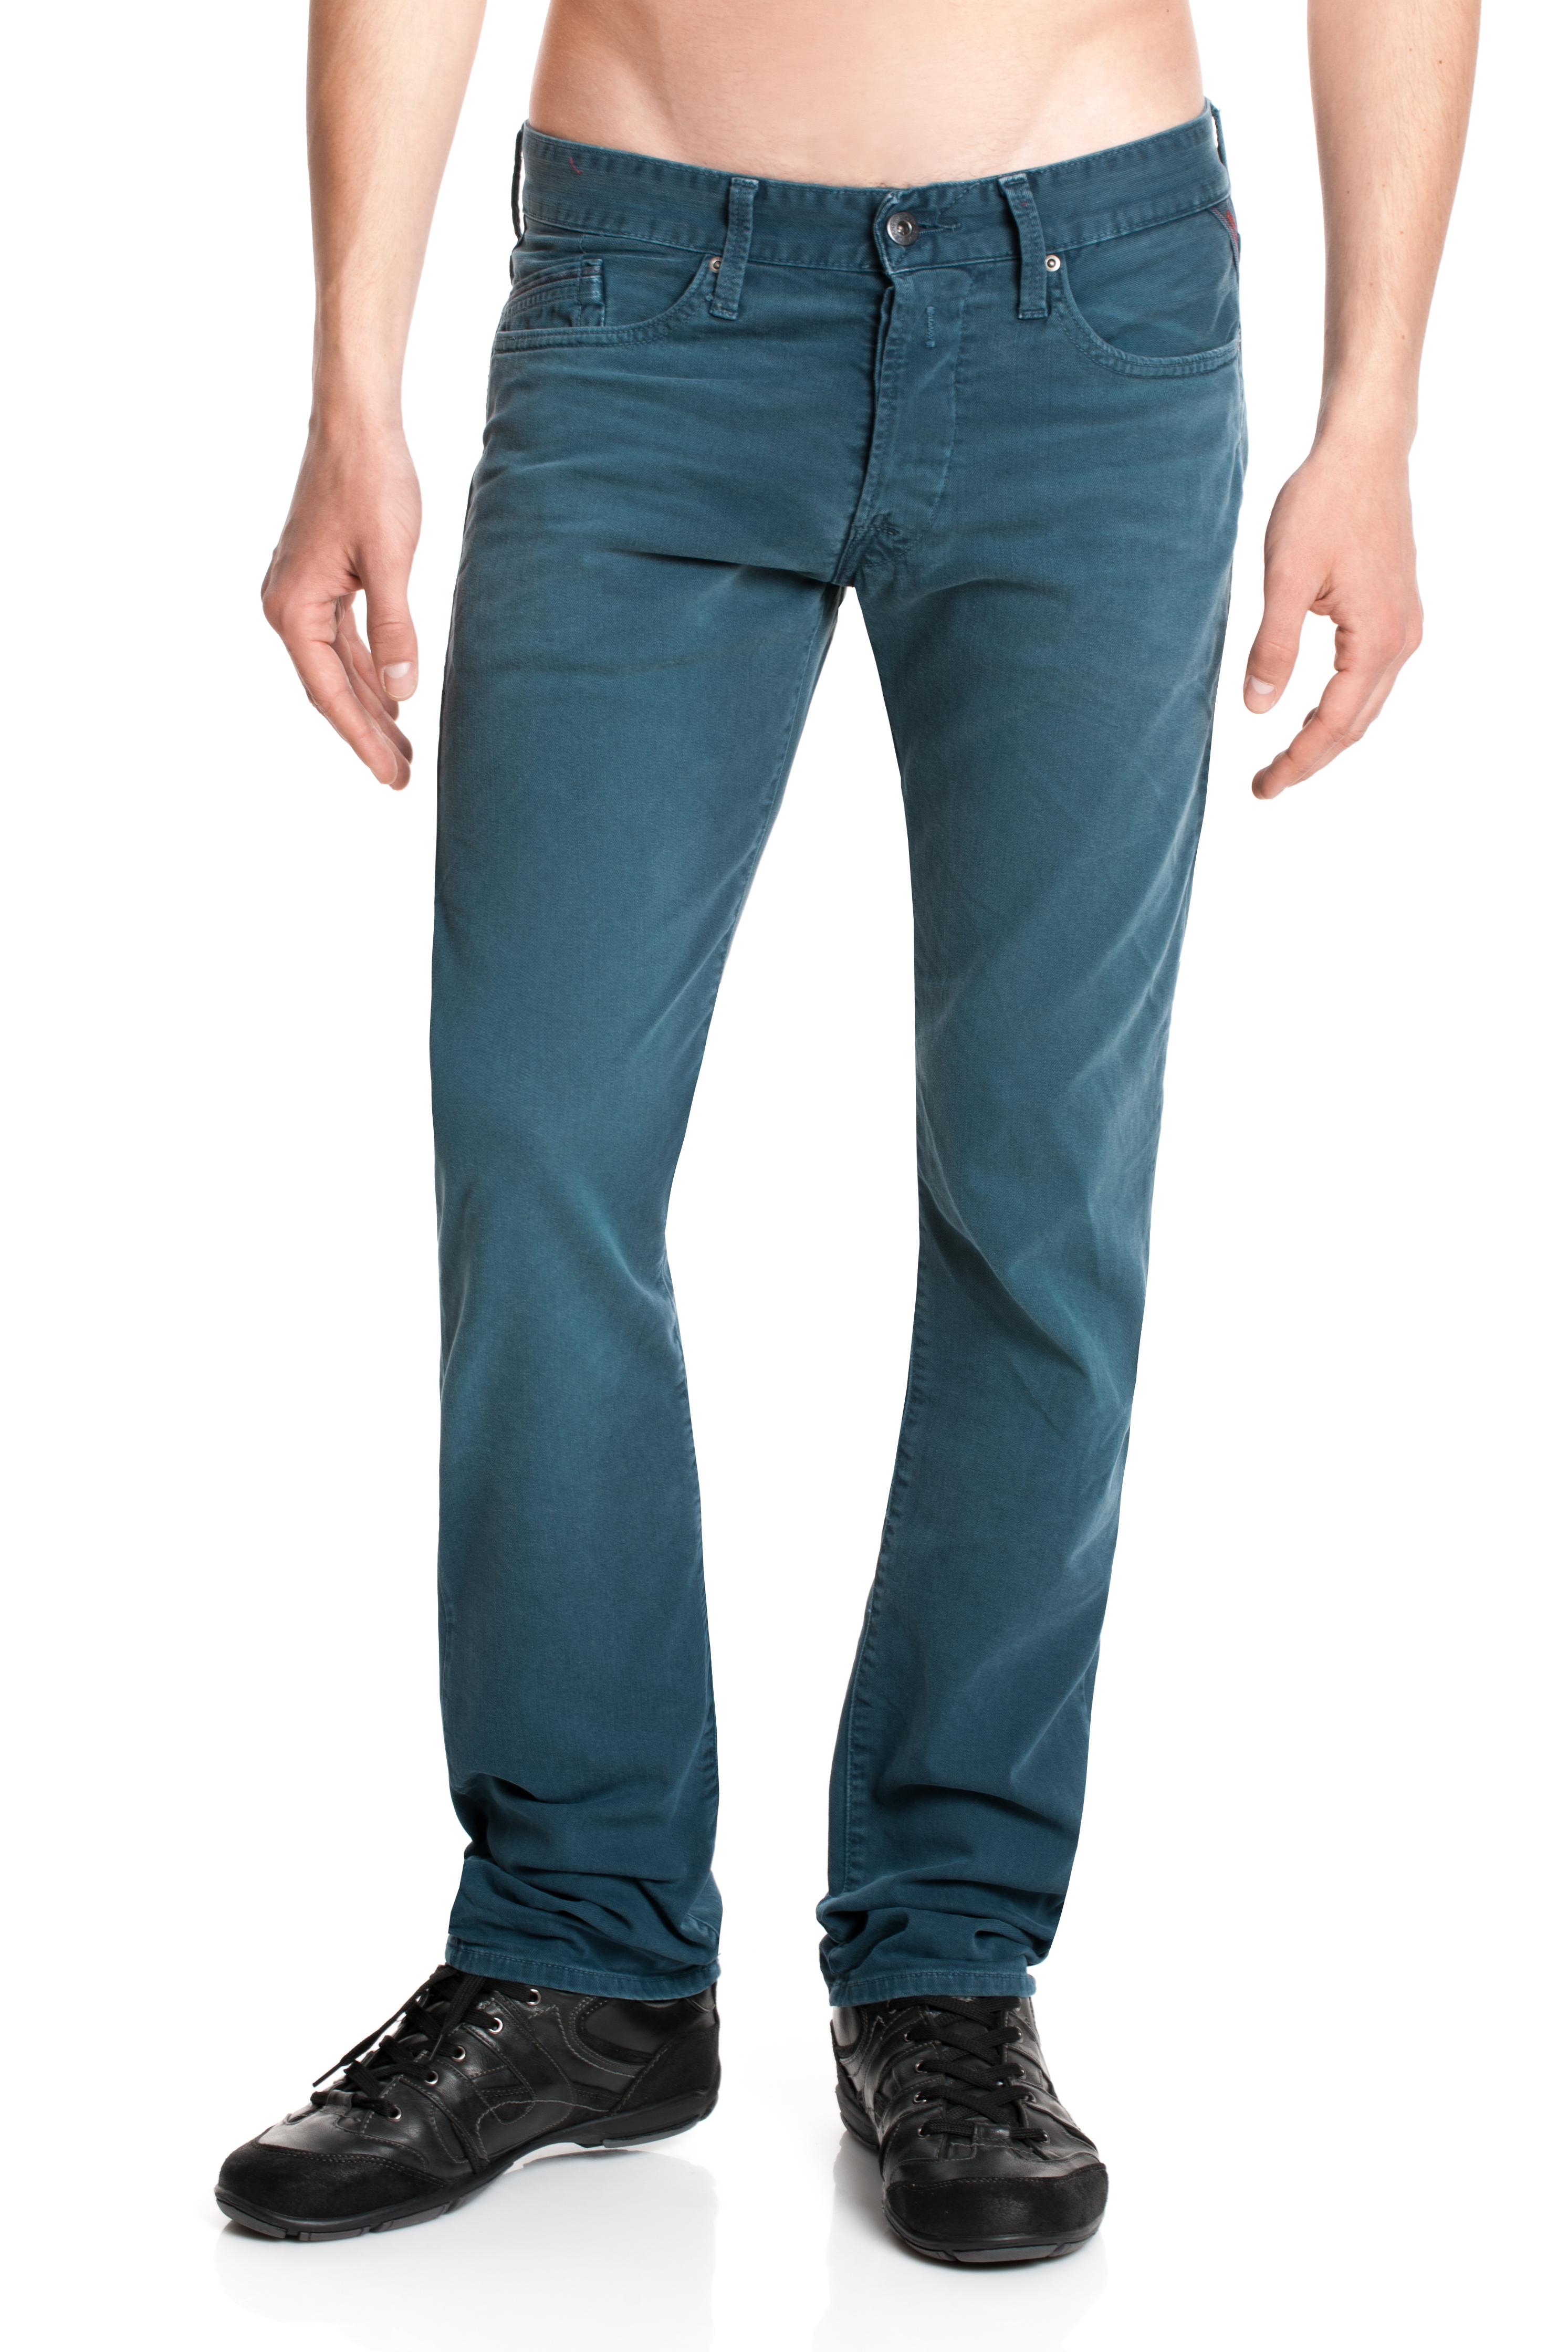 Replay Jeans Waitom